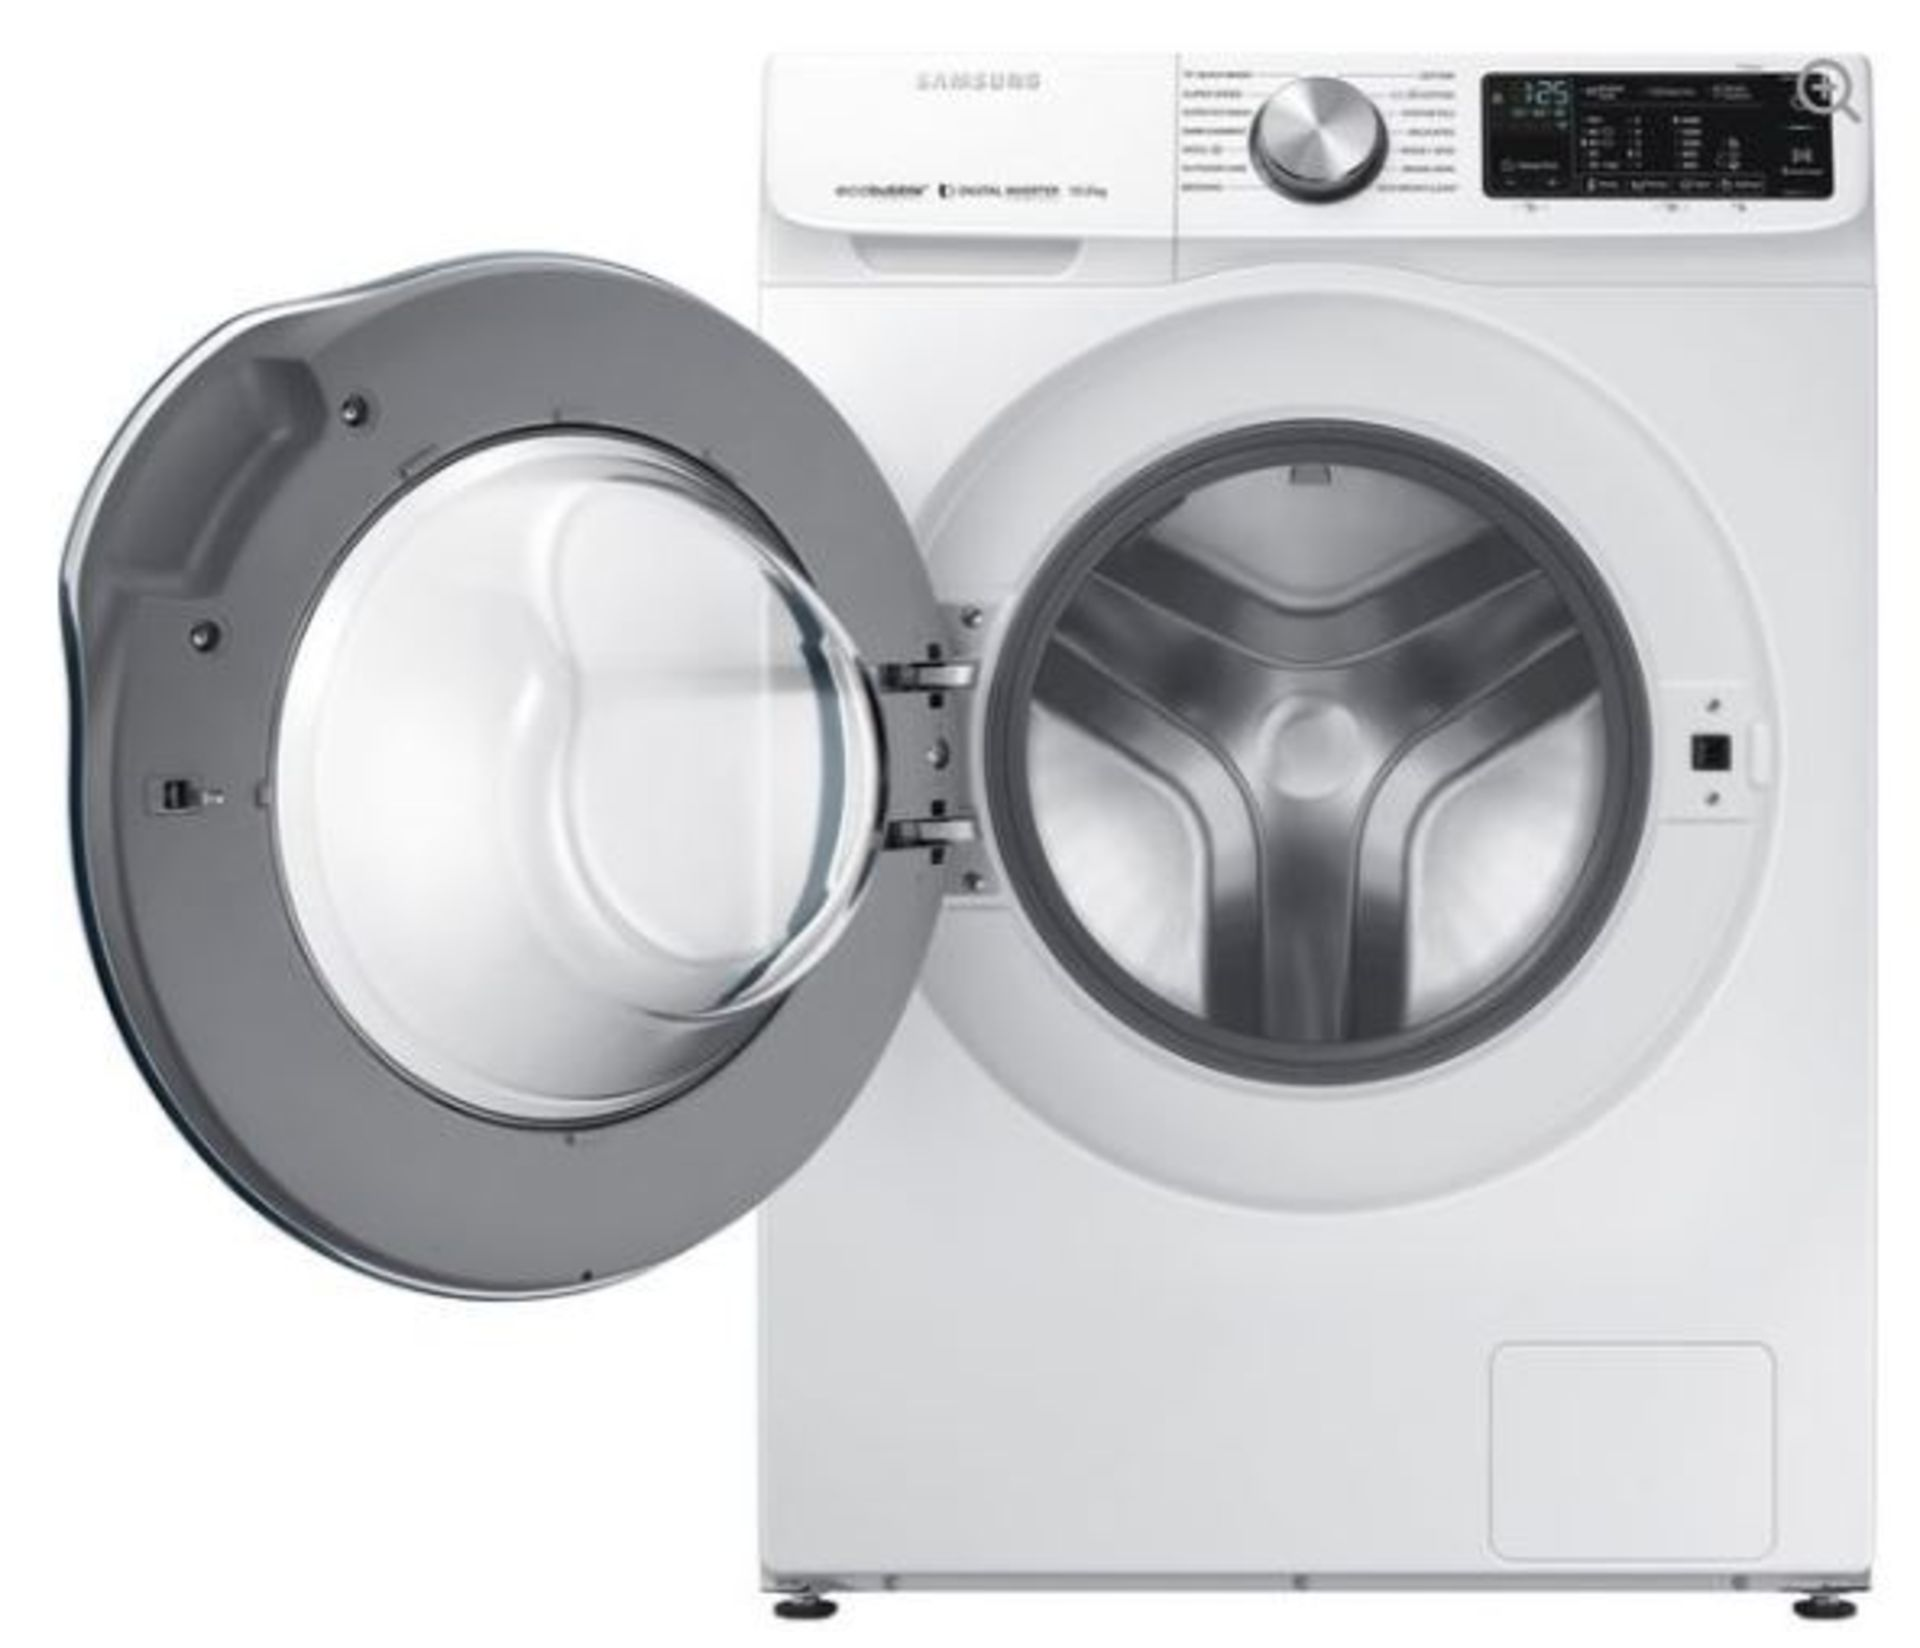 Pallet of 2 Samsung Premium Washing machines. Total Latest selling price £1,219.97* - Image 2 of 8